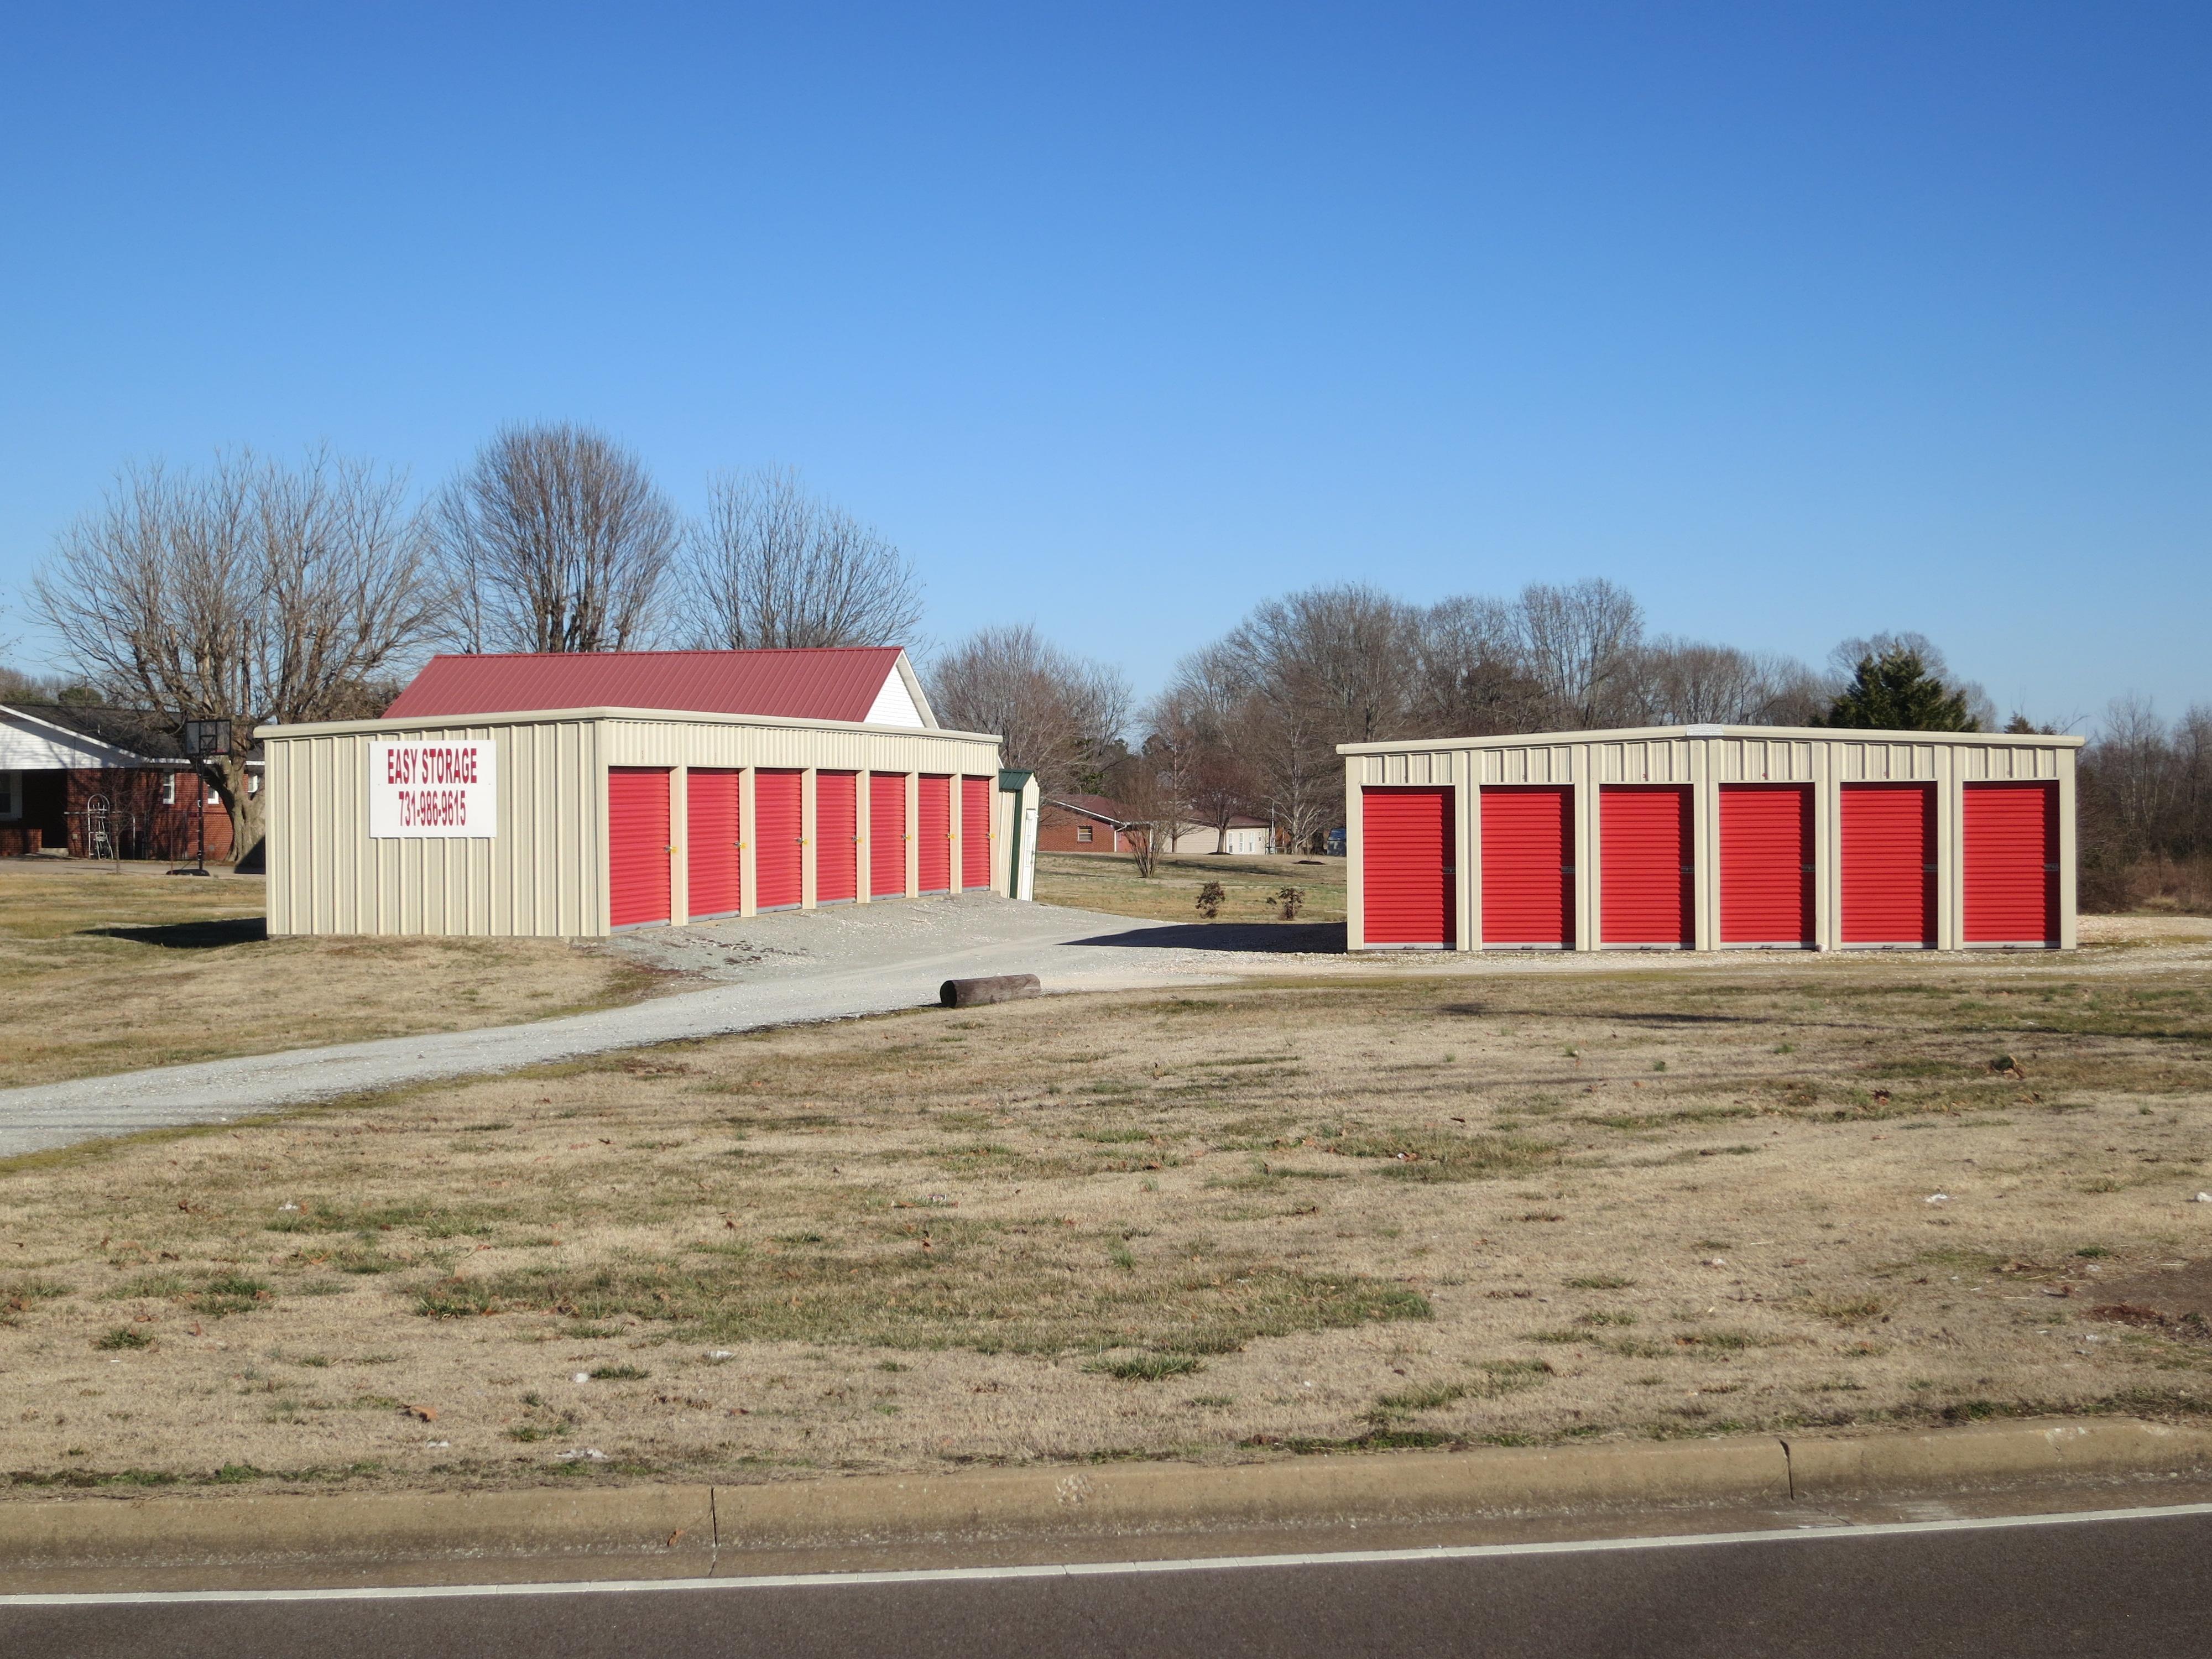 Tennessee carroll county clarksburg - Easy_storage_2 Jpg